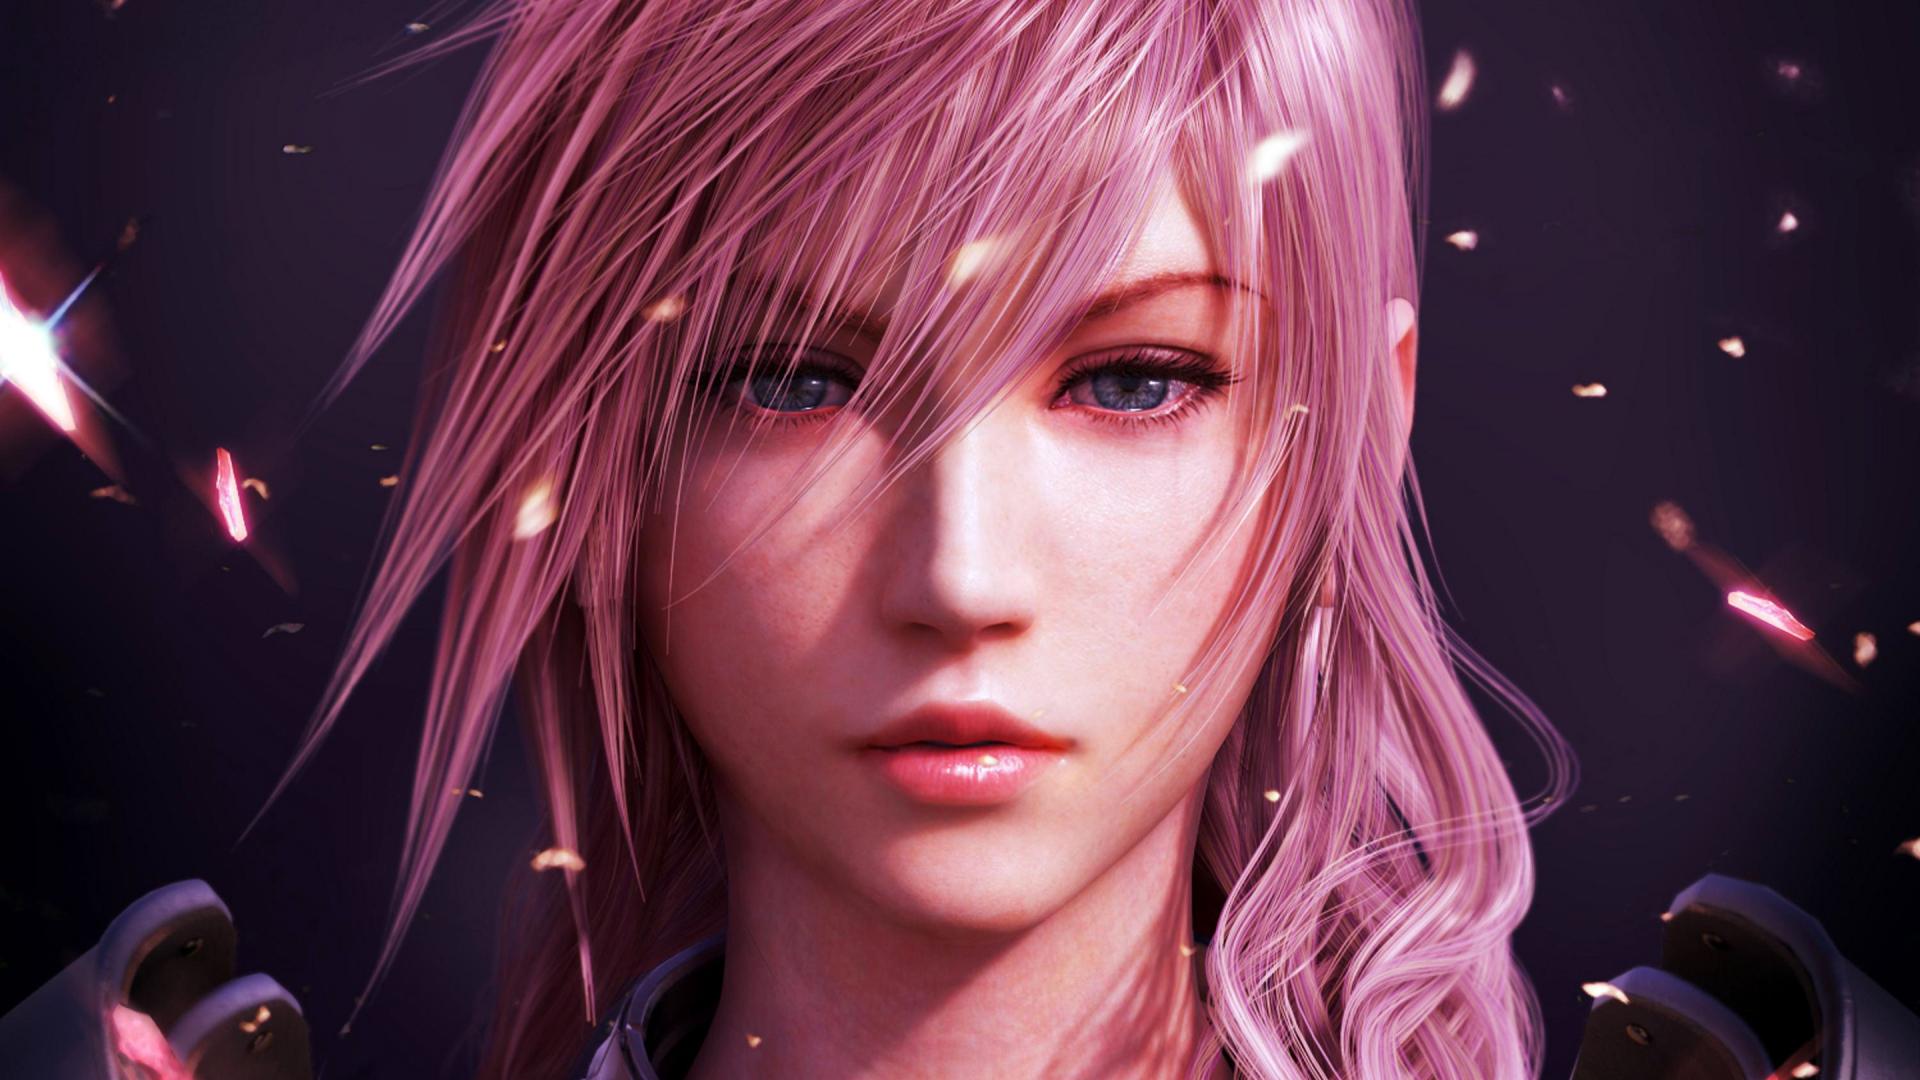 Download 1920x1080 Wallpaper Final Fantasy Lightning Video Game Girl Warrior Full Hd Hdtv Fhd 1080p 1920x1080 Hd Image Background 4239